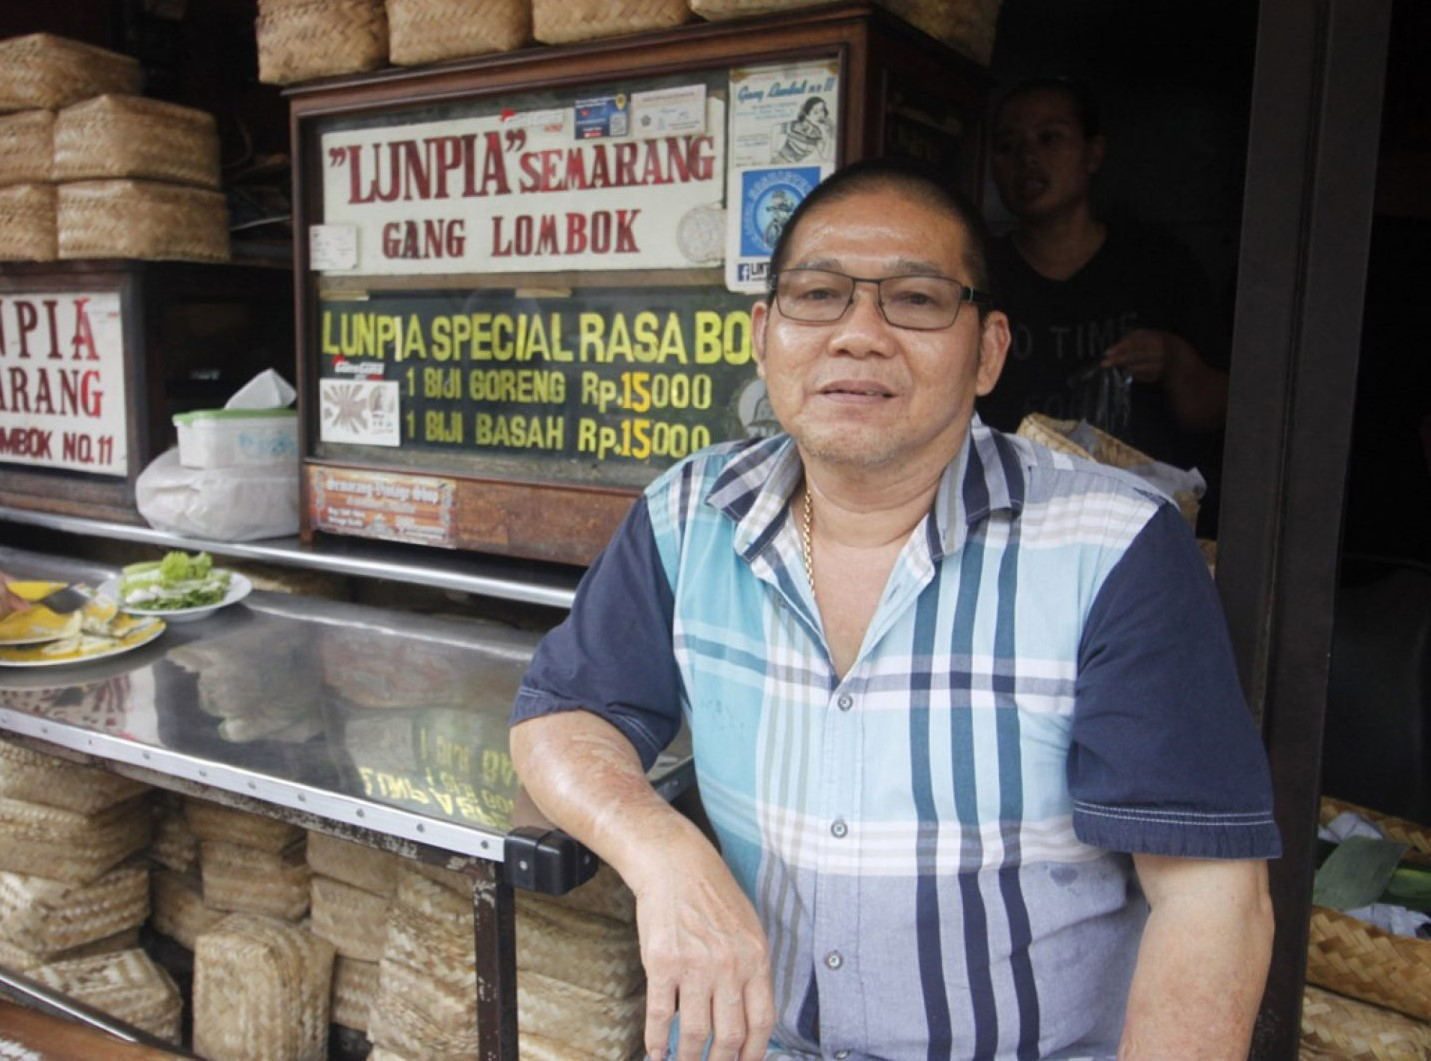 Potret Purnomo Usodo pemilik Lumpia Gang Lombok| Foto: Jawapos